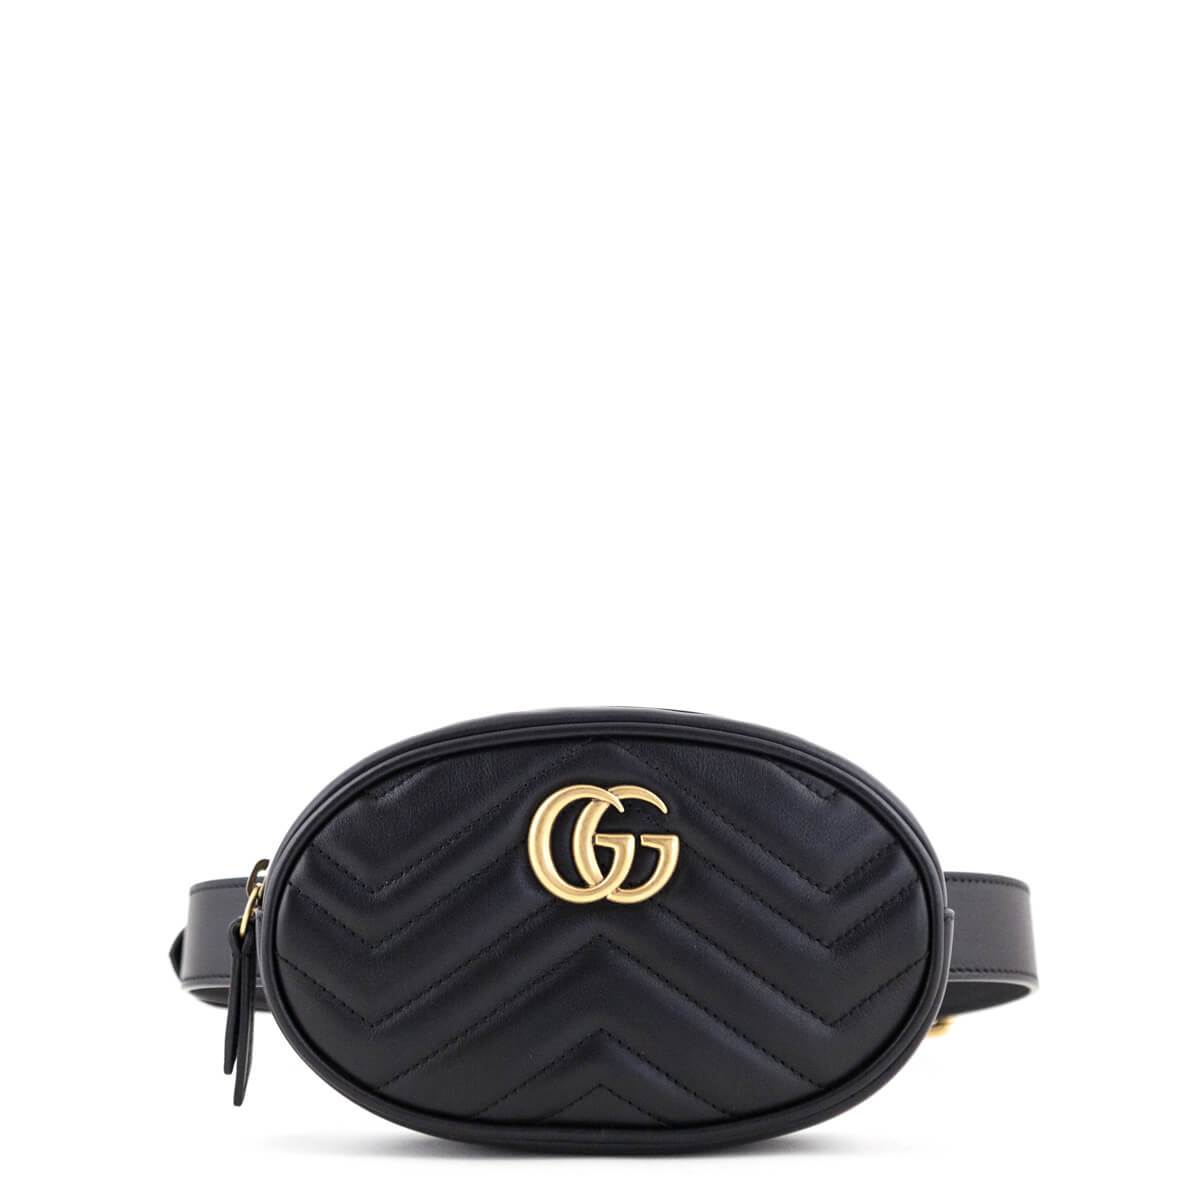 Thắt lưng kèm Gucci belt bag